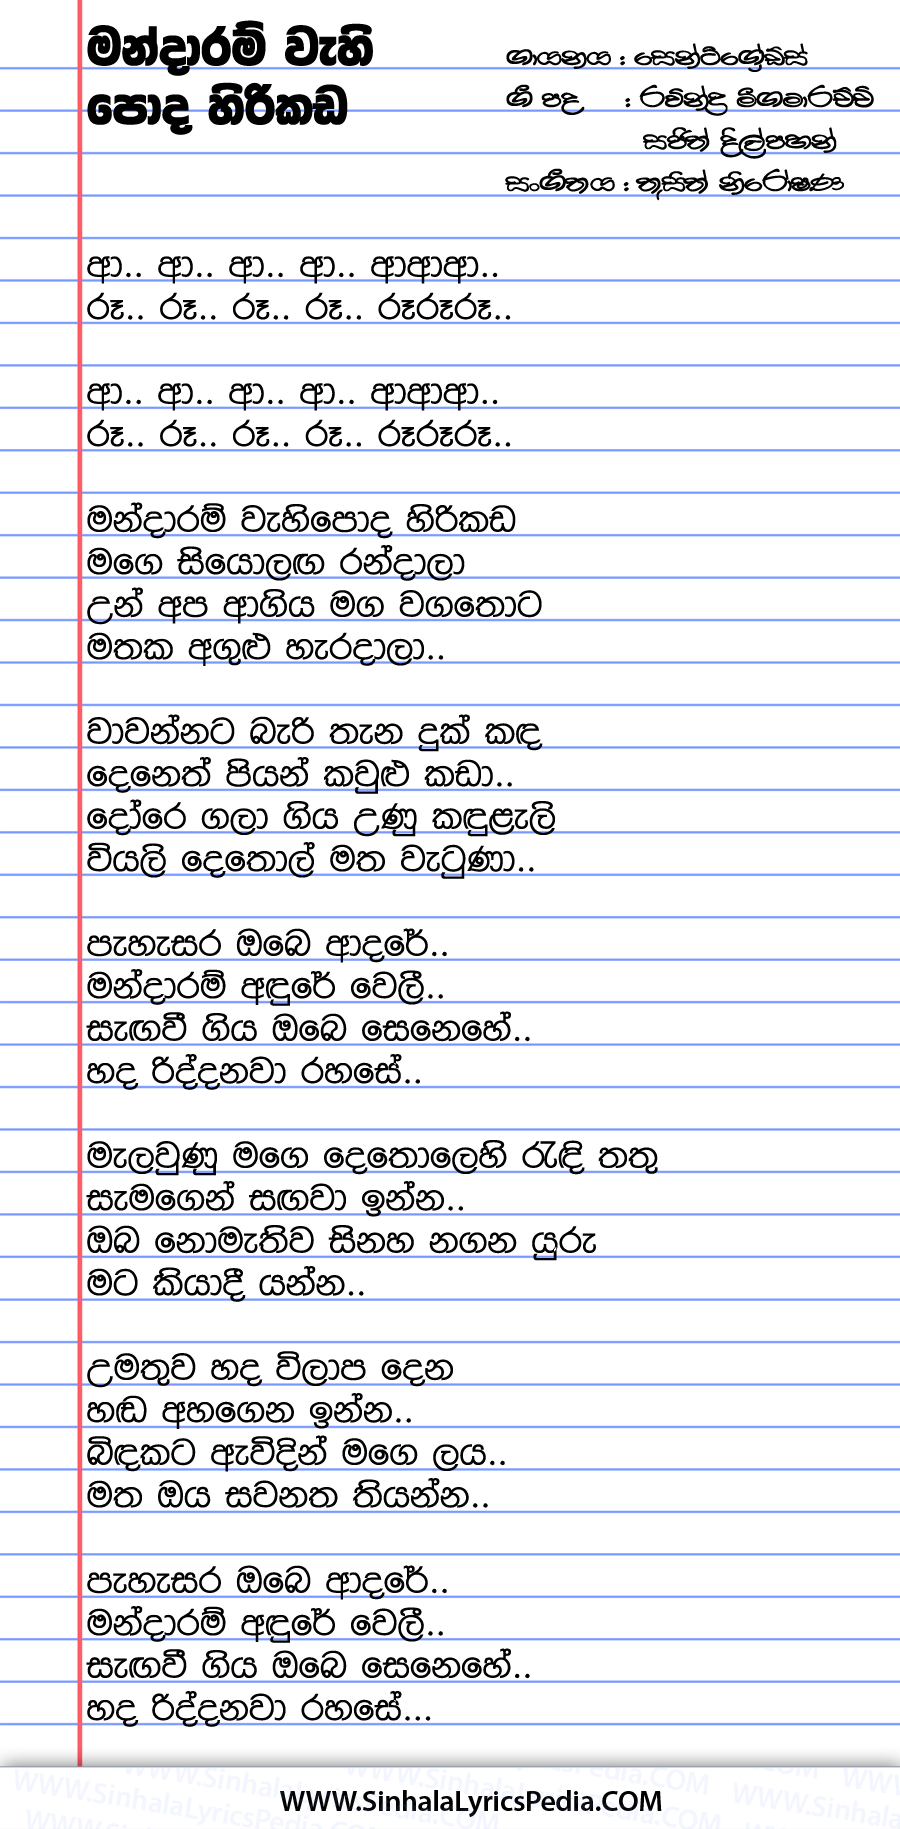 Pahasara Obe Adare Song Lyrics